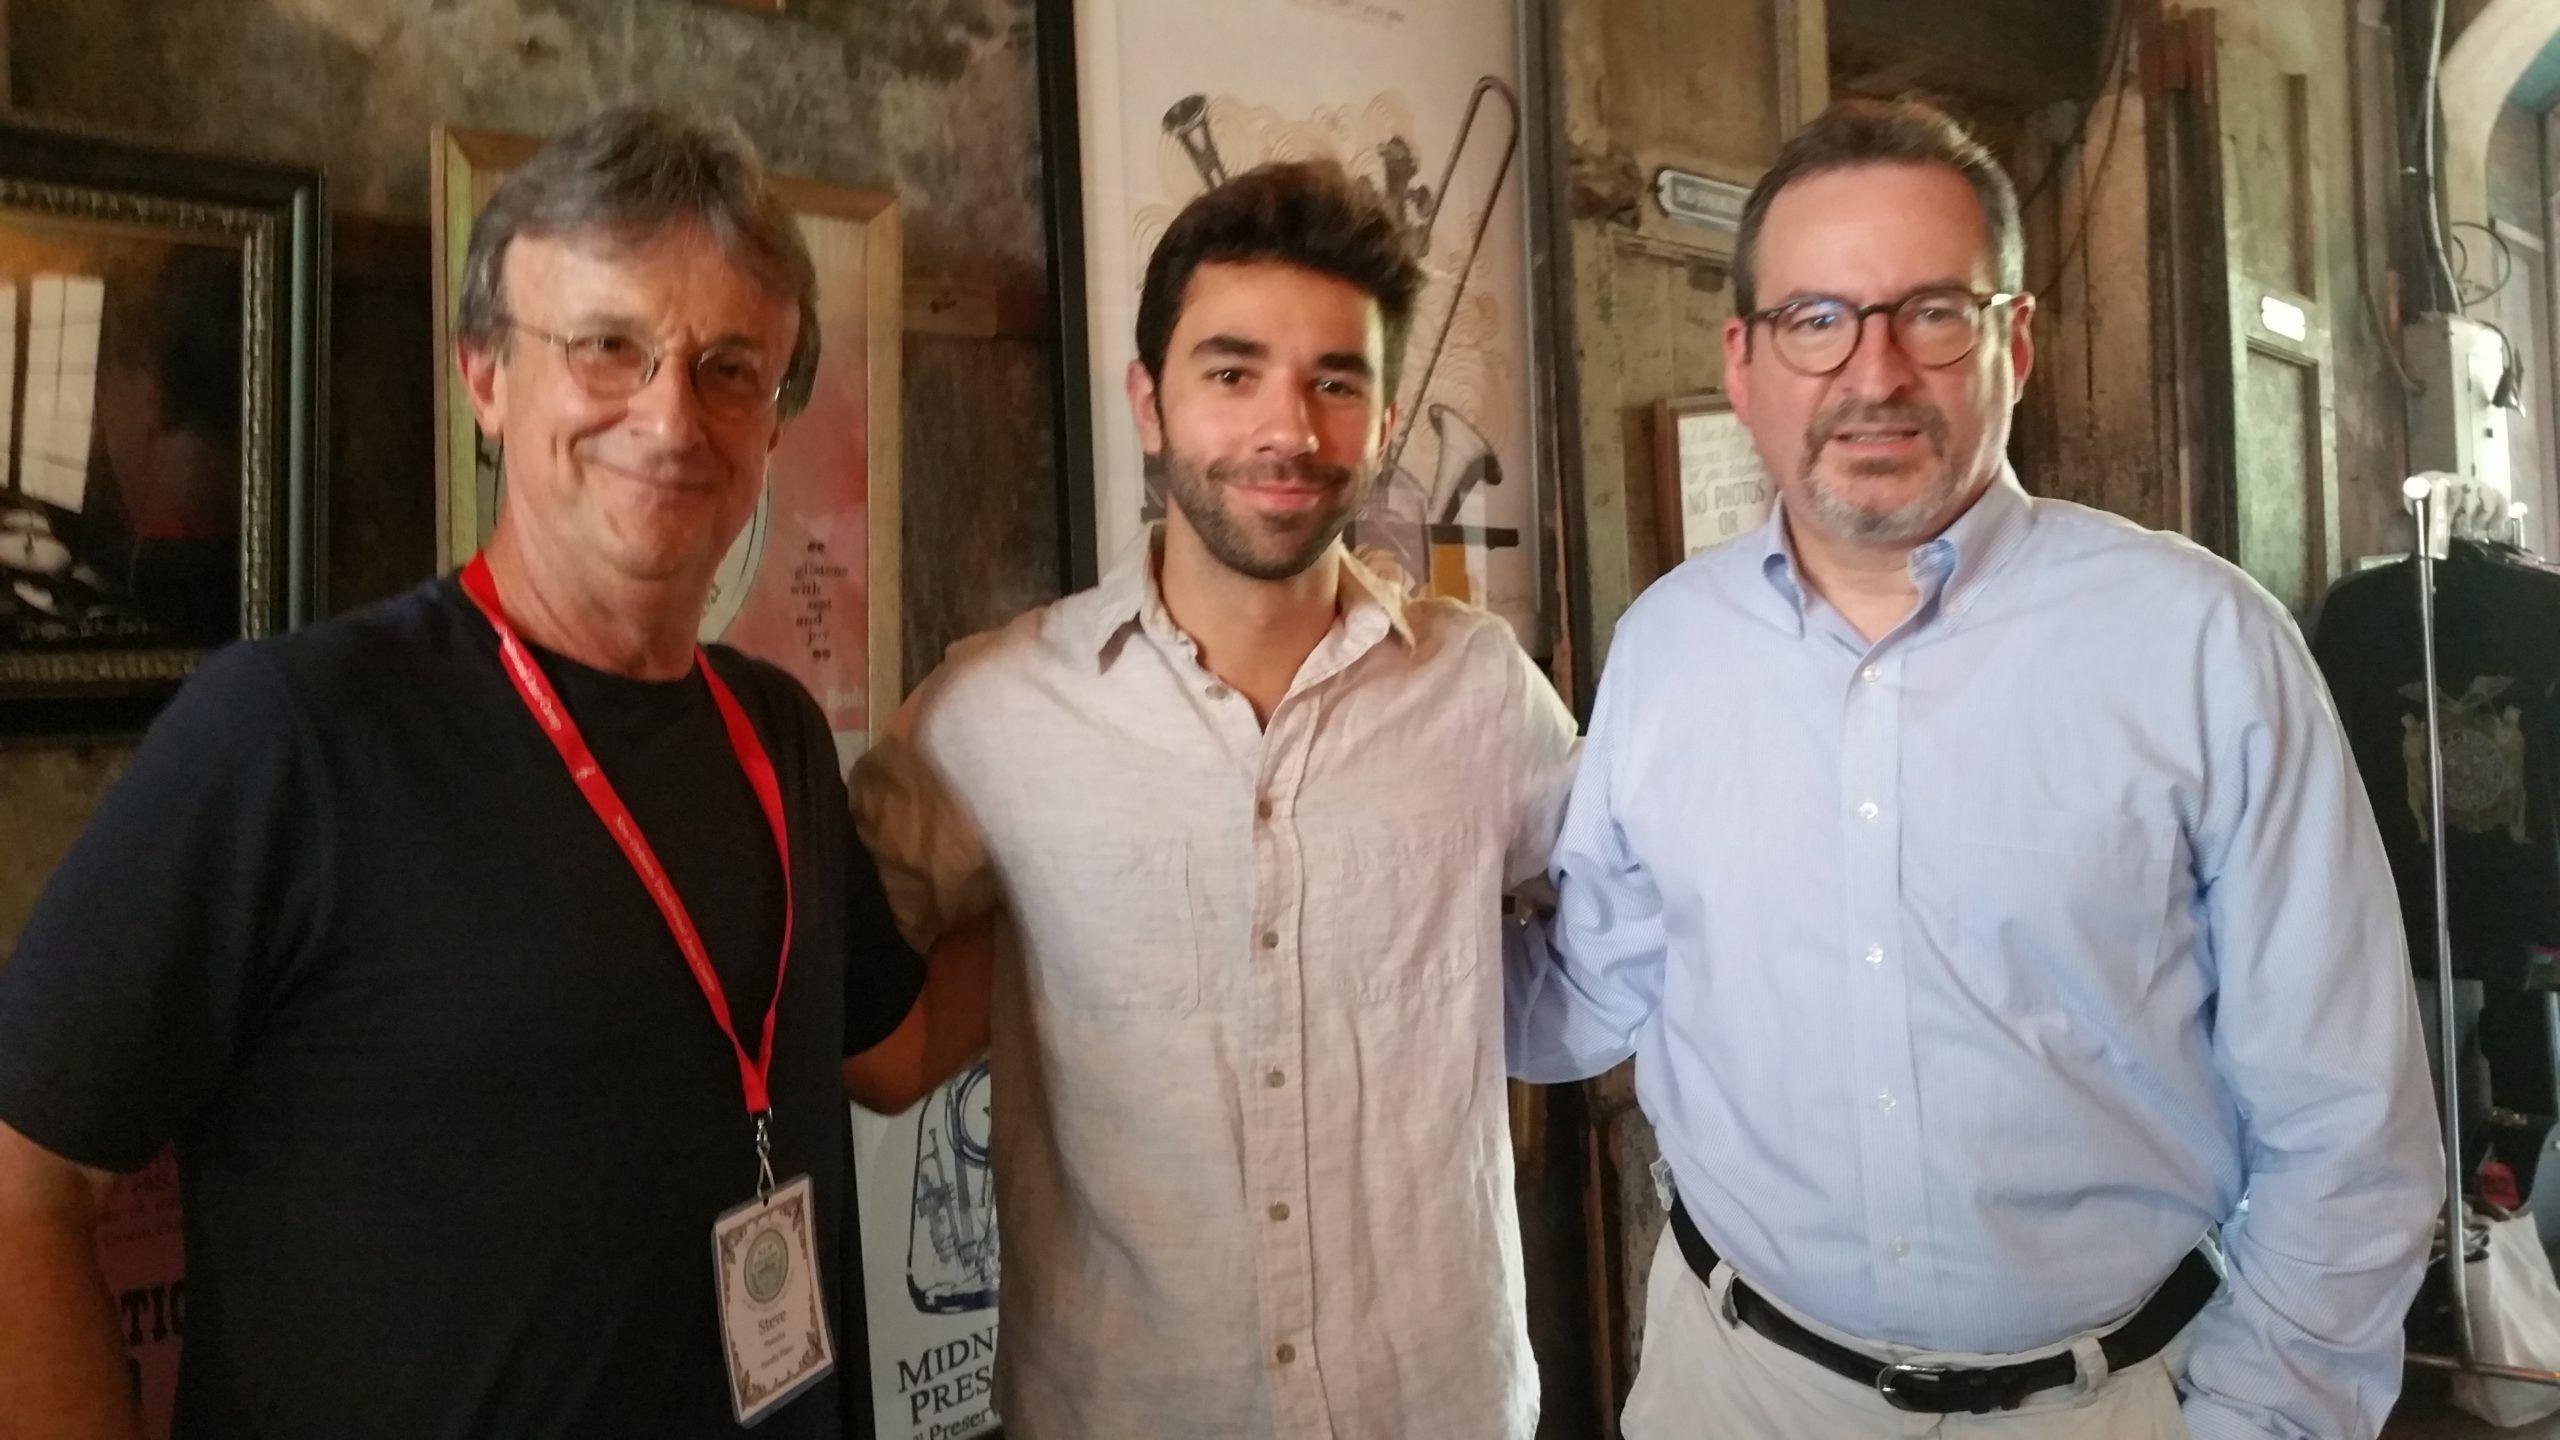 Piano instructors at New Orleans Trad Jazz Camp - Steve, Kris Tokarski, David Boeddinghaus